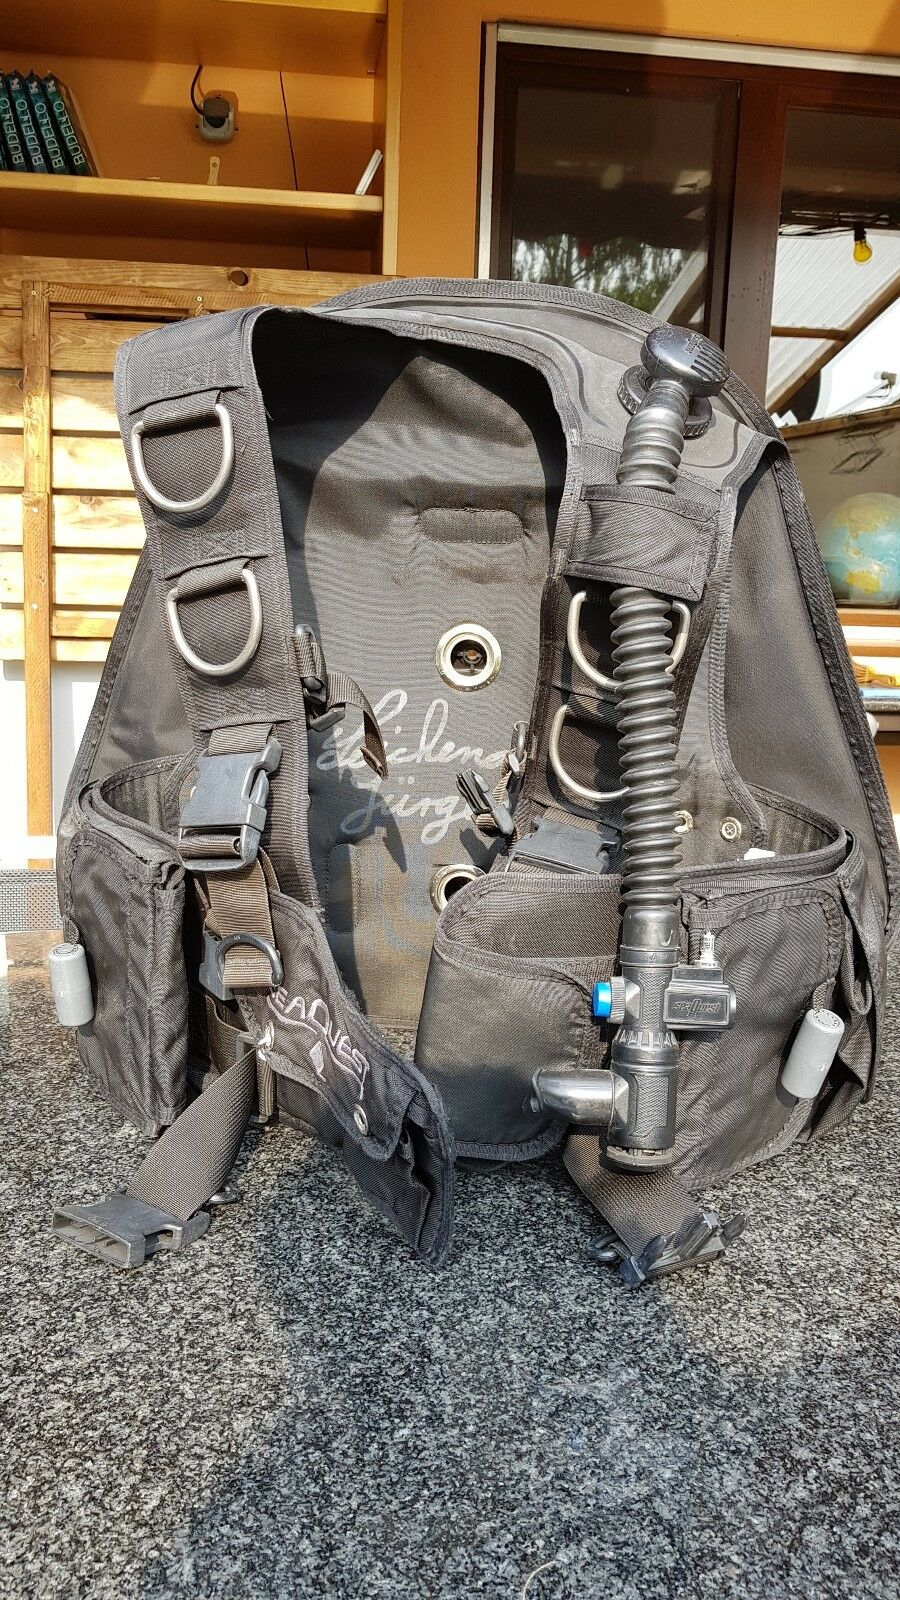 Tauchjacket Seaquest, Größe L, 22,5 Liter, Blei integriert, gebraucht